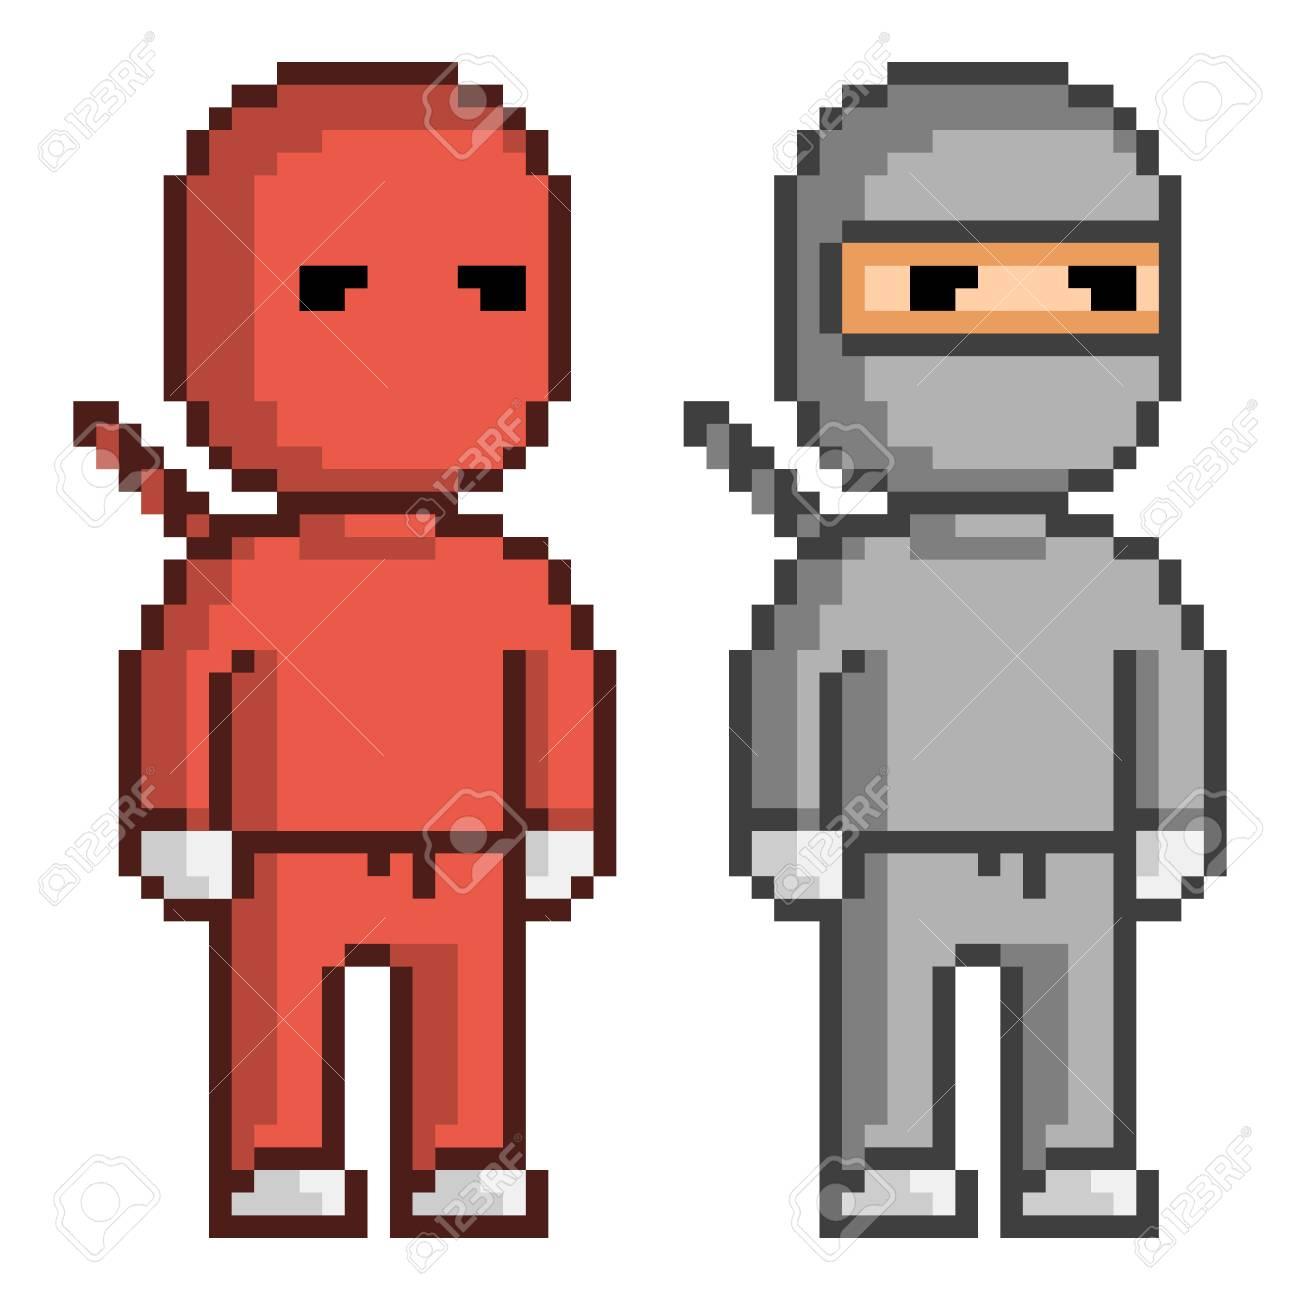 Vector Pixel Art Red And Black Ninja Pixel Units For 8 Bit Video